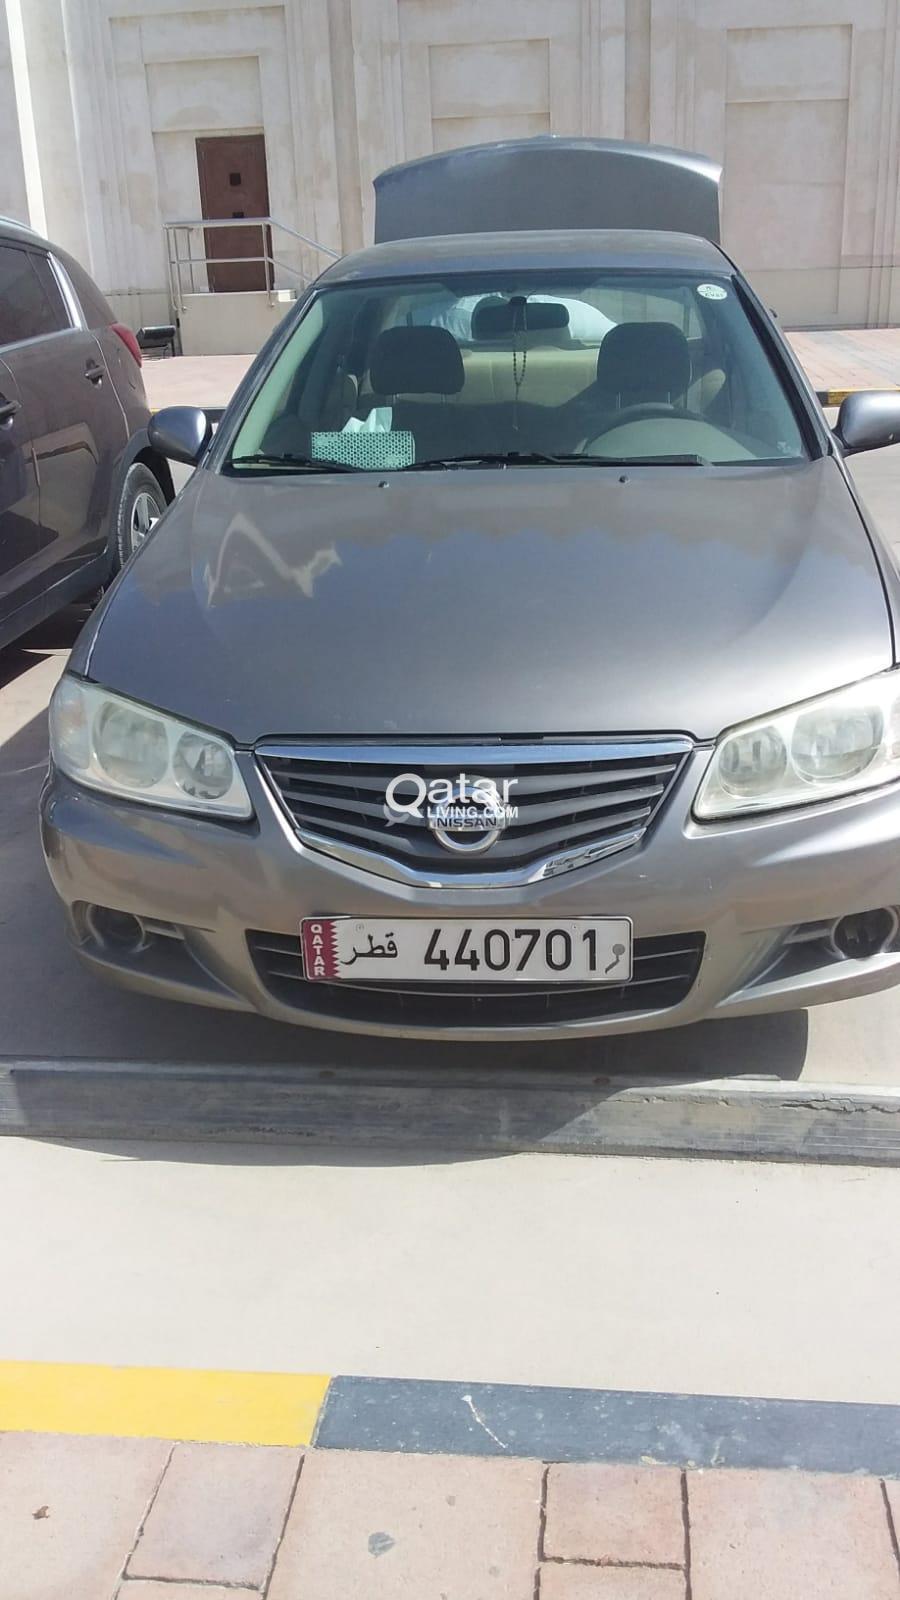 Nissan Sunny Classic 2011 Japan Made For Sale Qatar Living